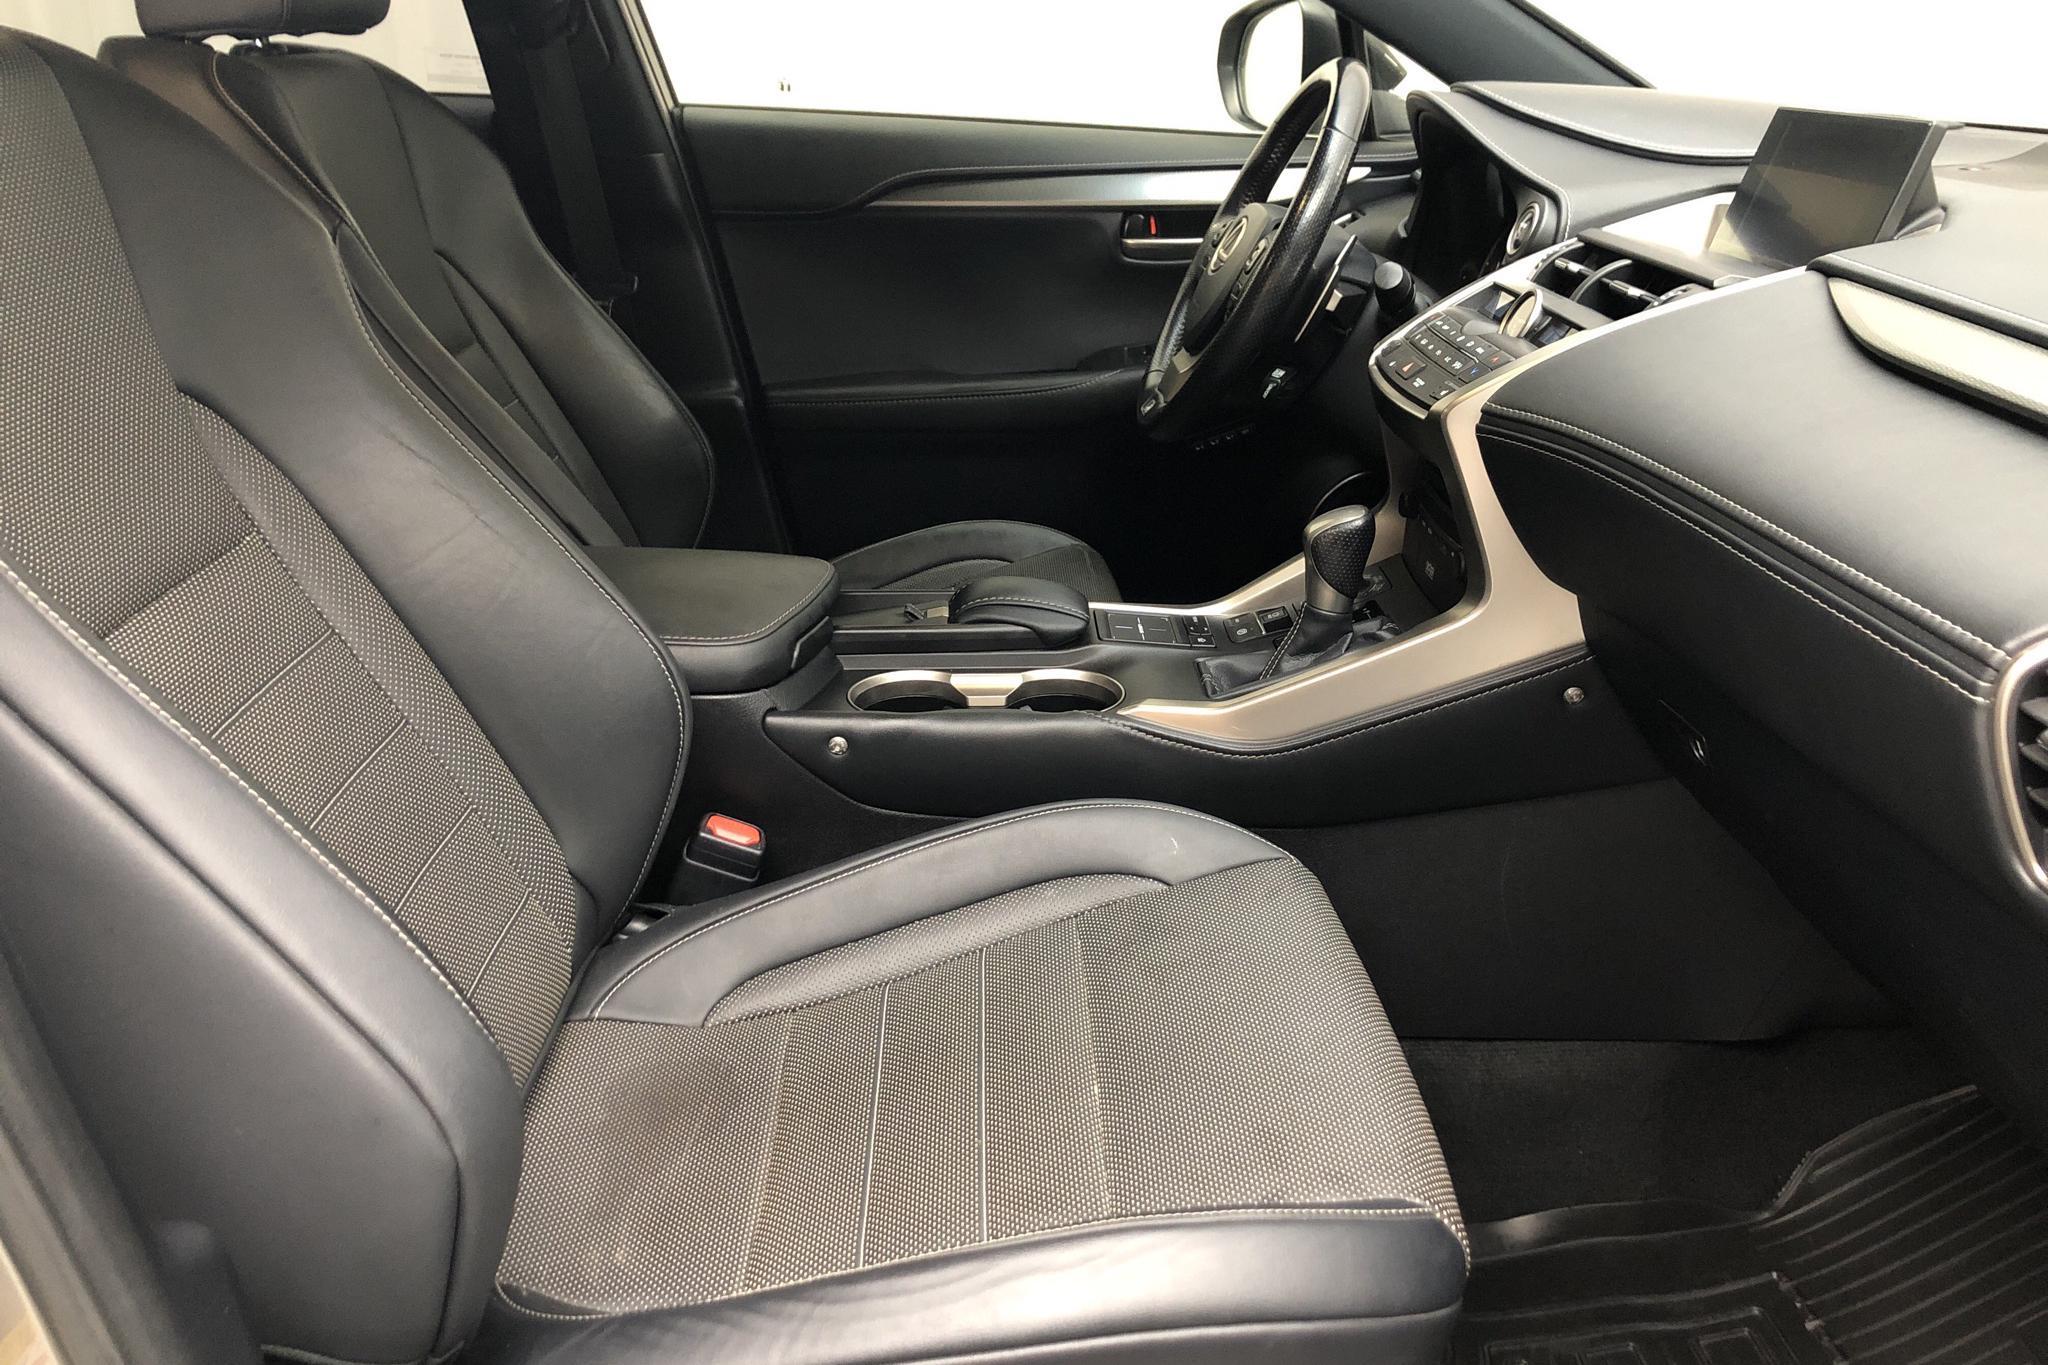 Lexus NX 300h AWD (181hk) - 100 490 km - Automatic - Light Grey - 2016